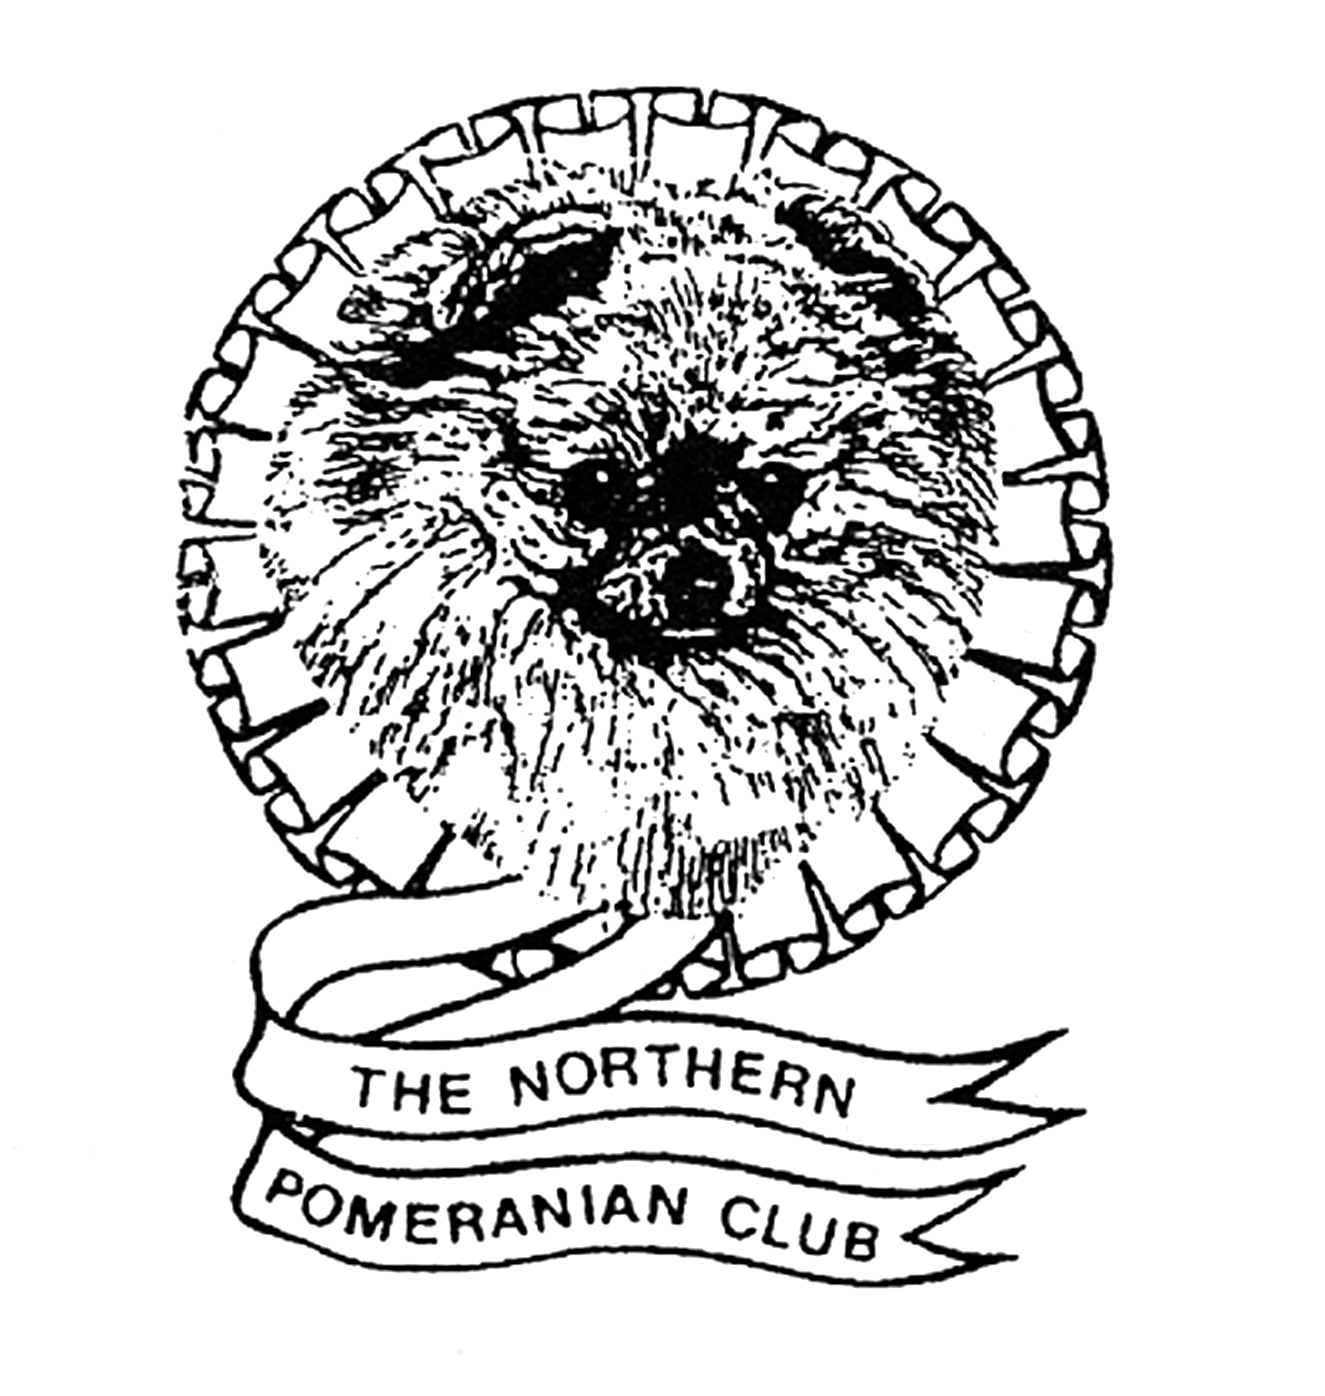 THE NORTHERN POMERANIAN CLUB Ch Show